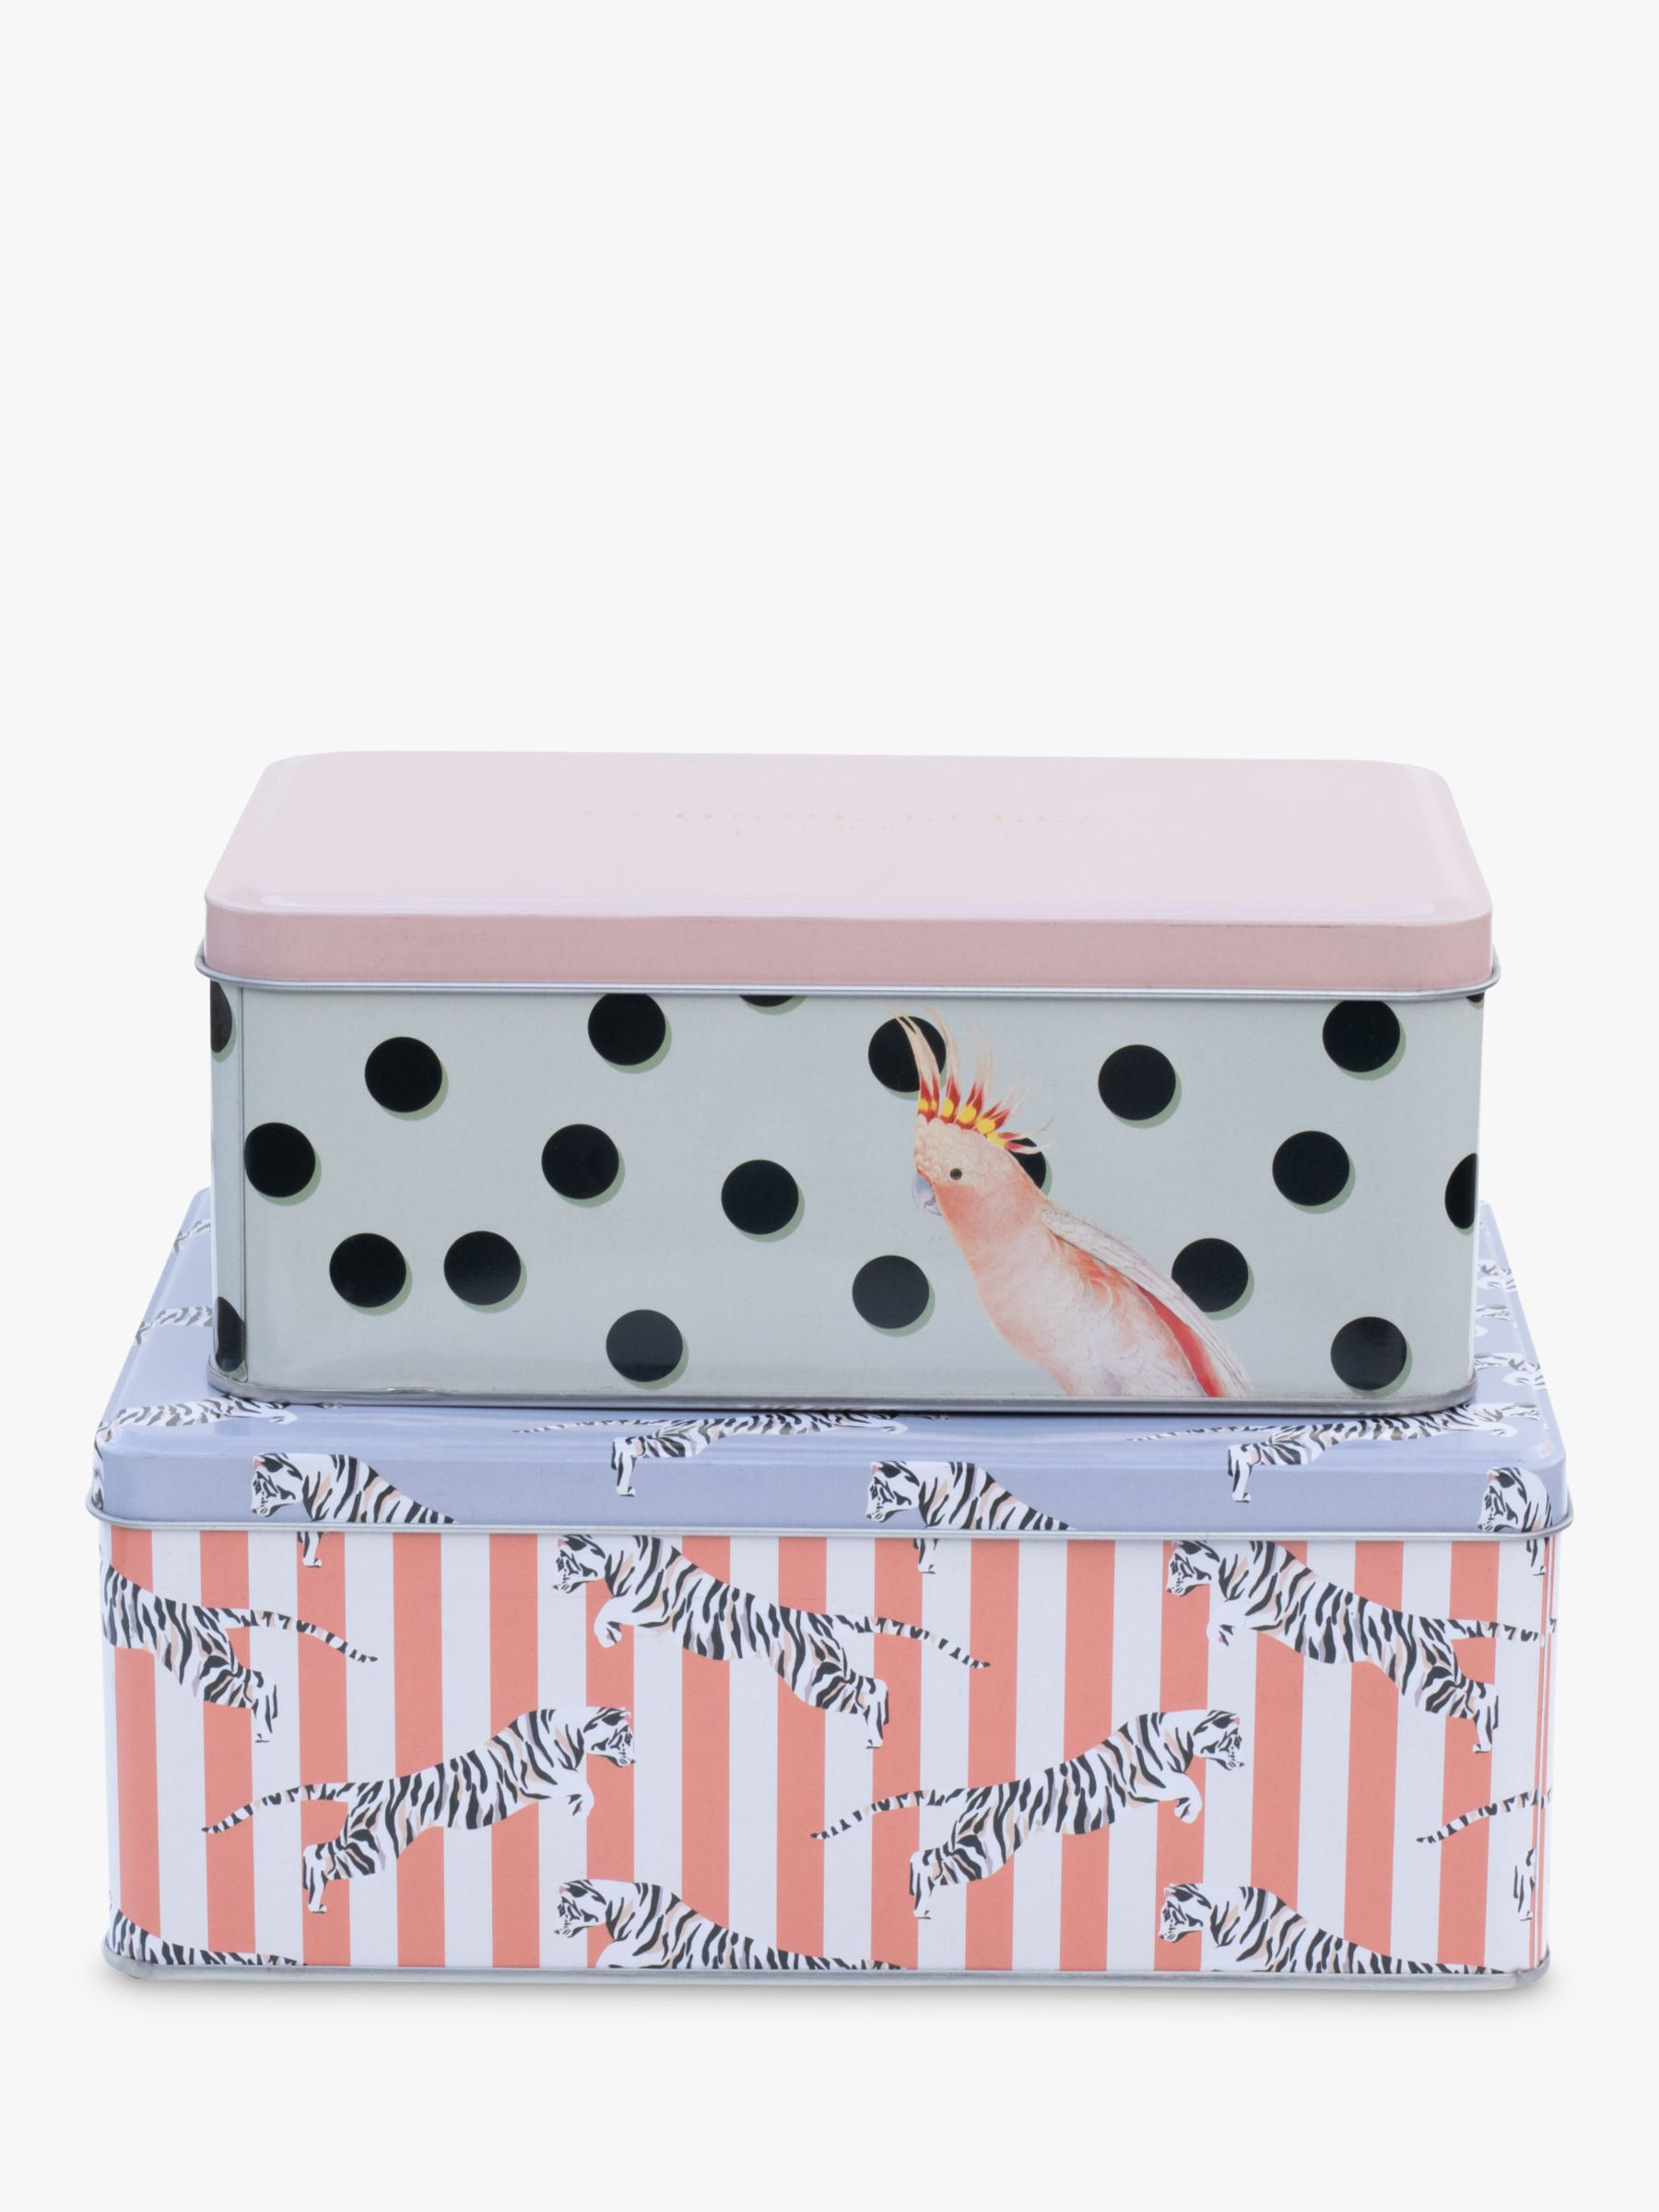 Yvonne Ellen Rectangular Cake Tins, Set of 2, Pink/Multi